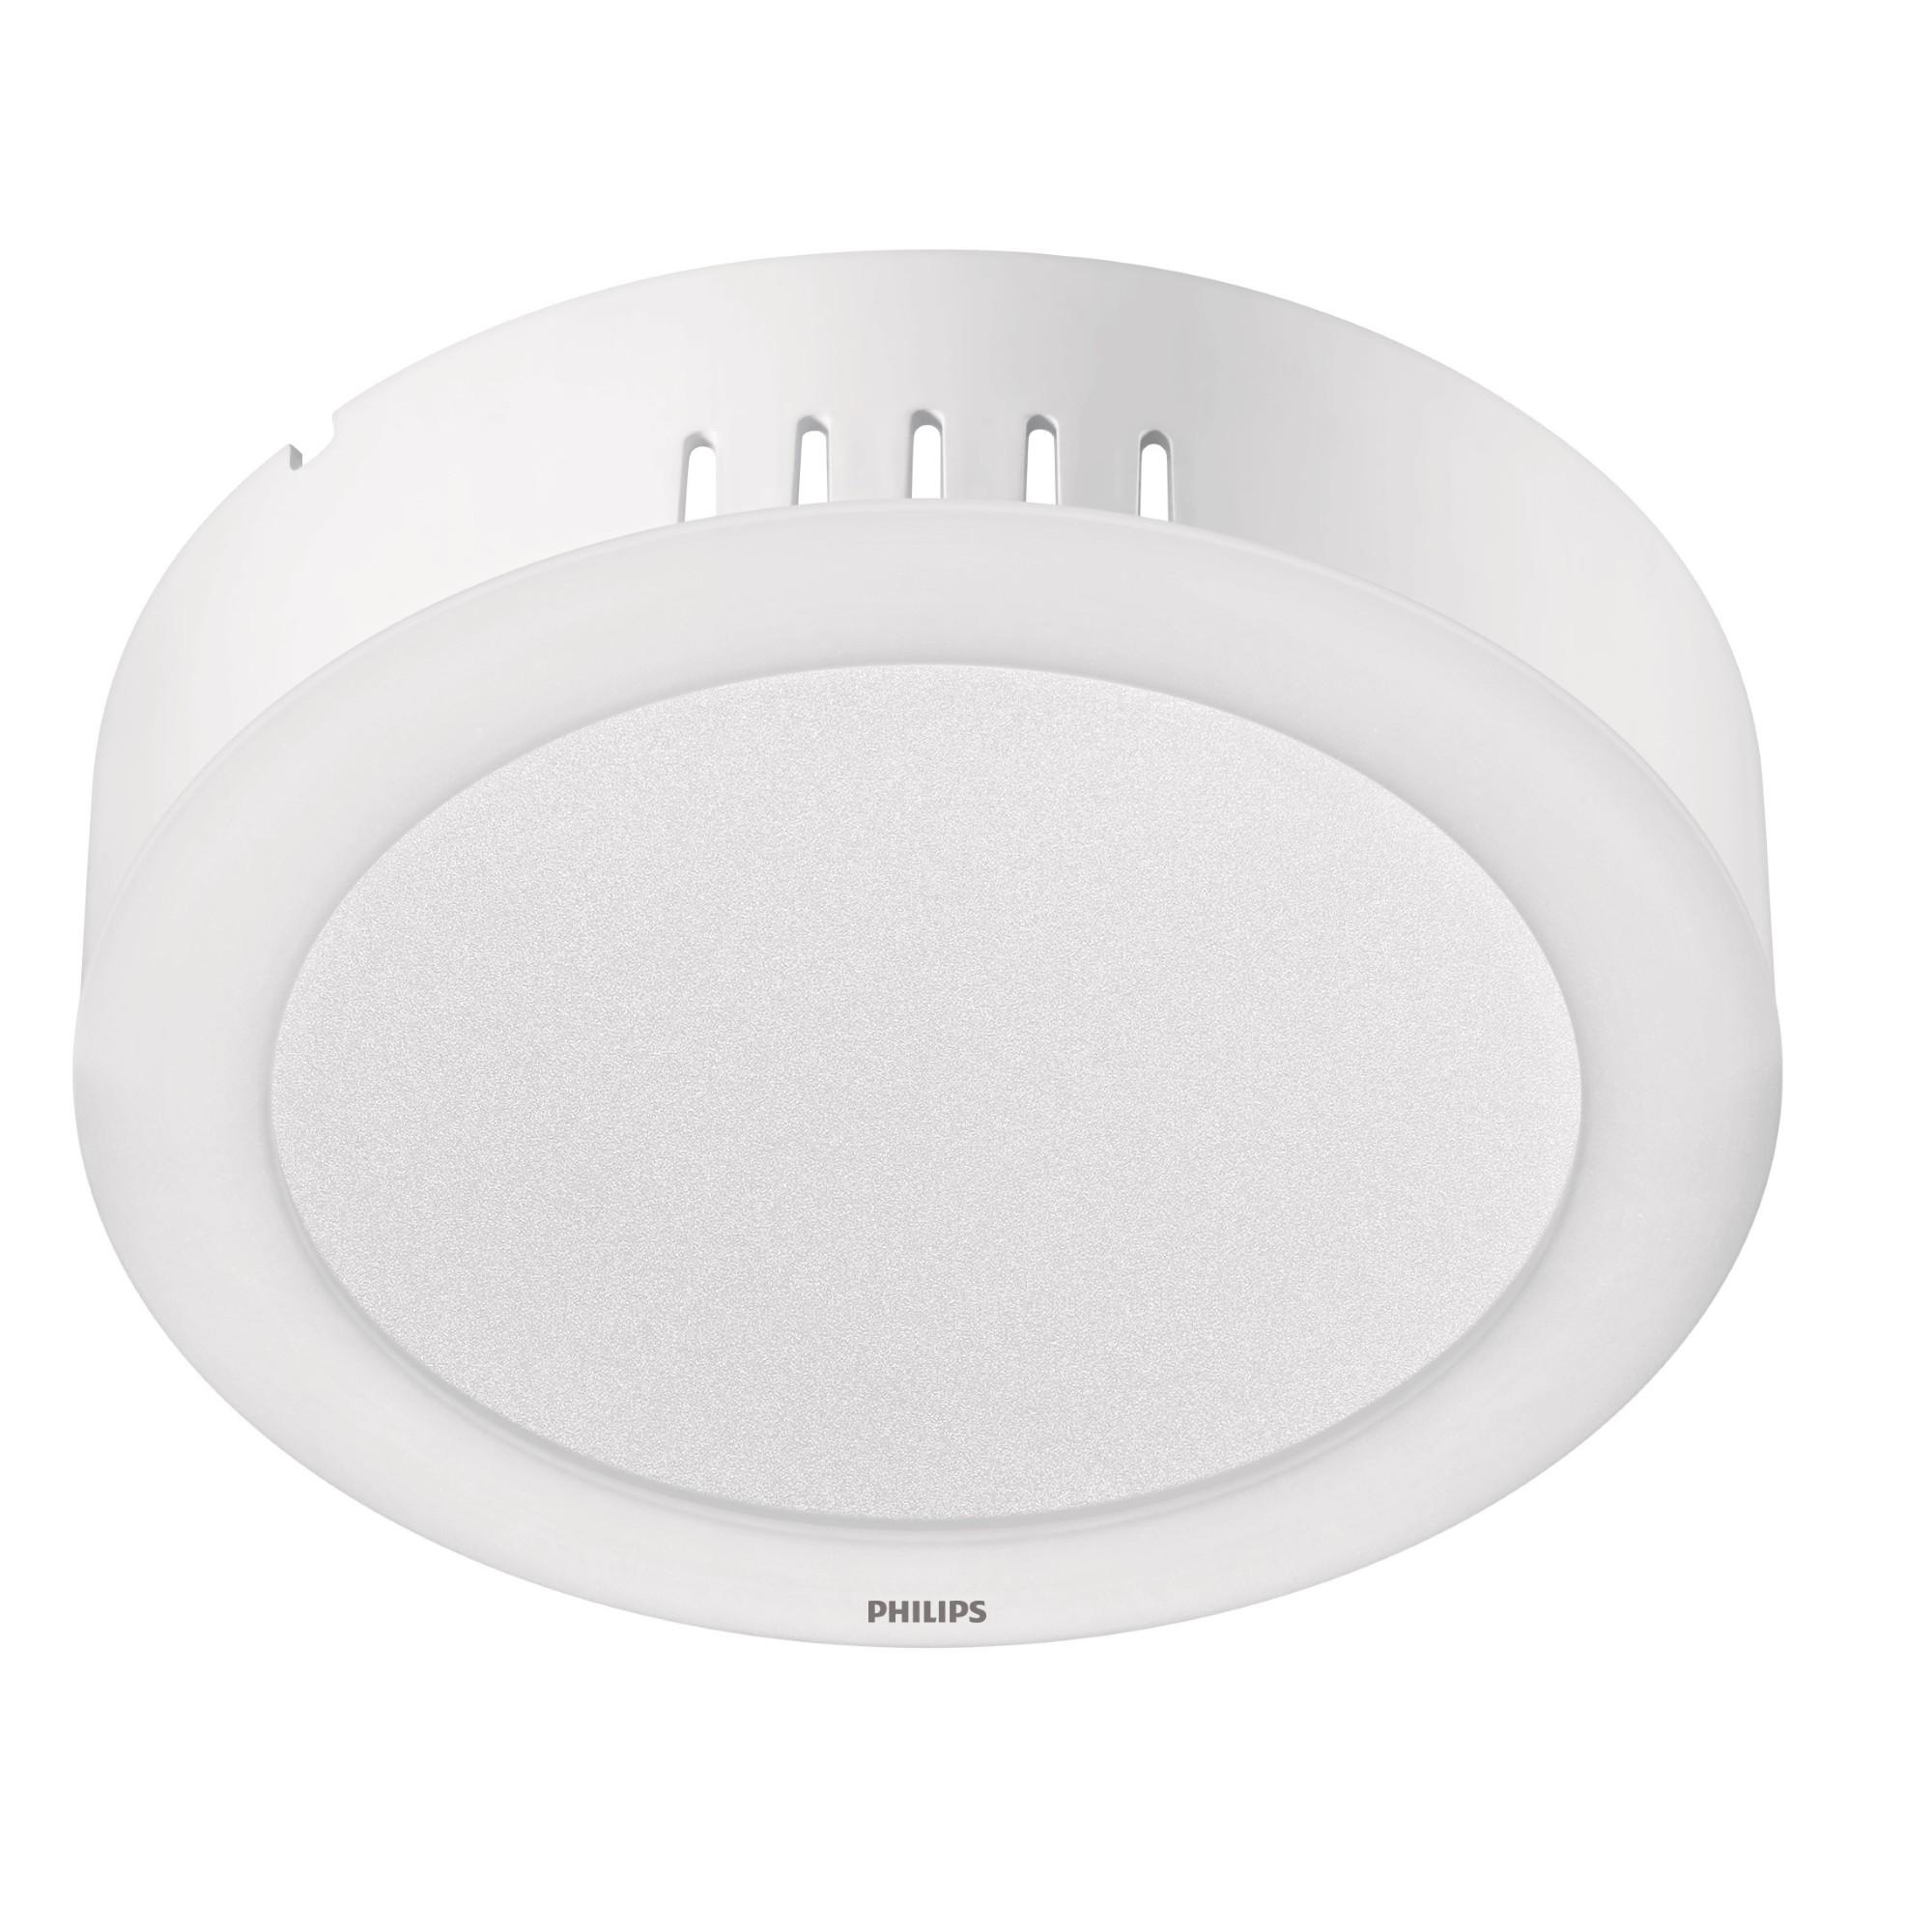 Painel LED Redondo 11W Luz Neutra 900lm - Philips